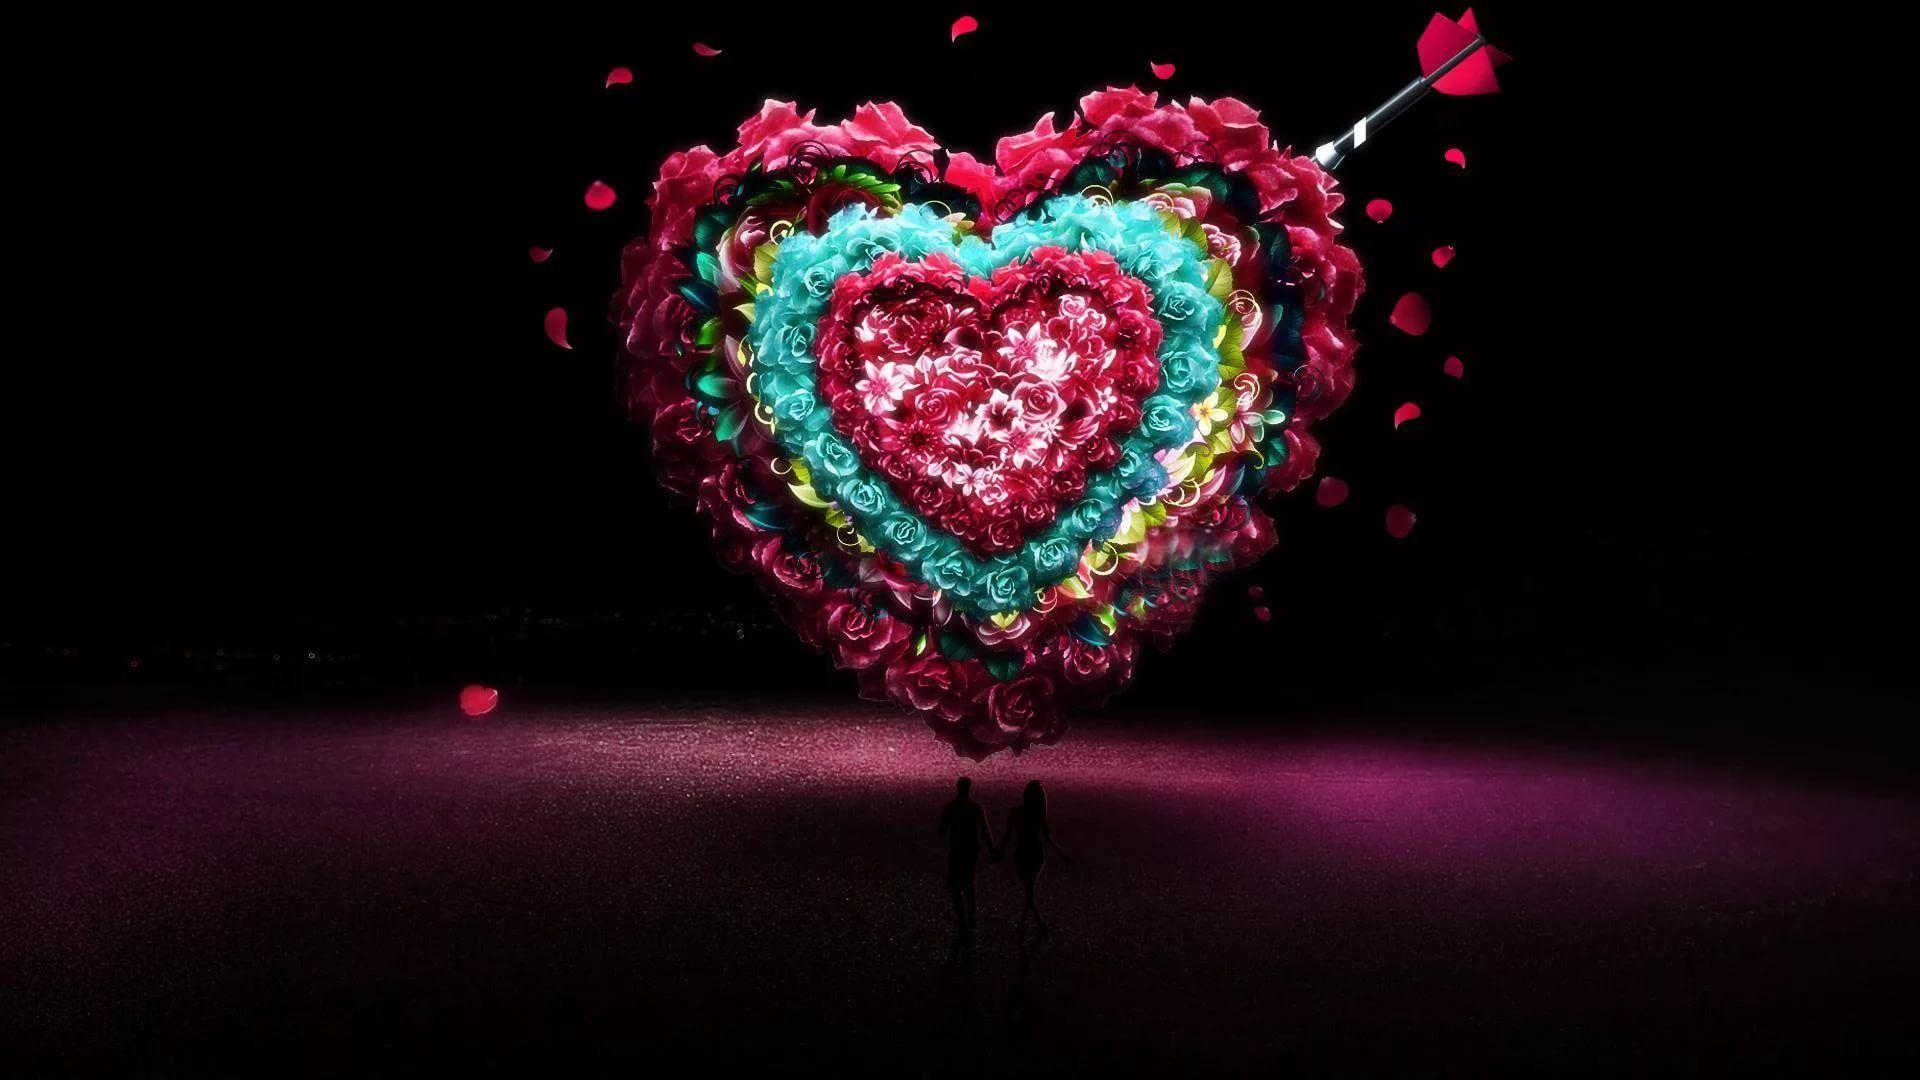 Valentine Screensaver full hd wallpaper